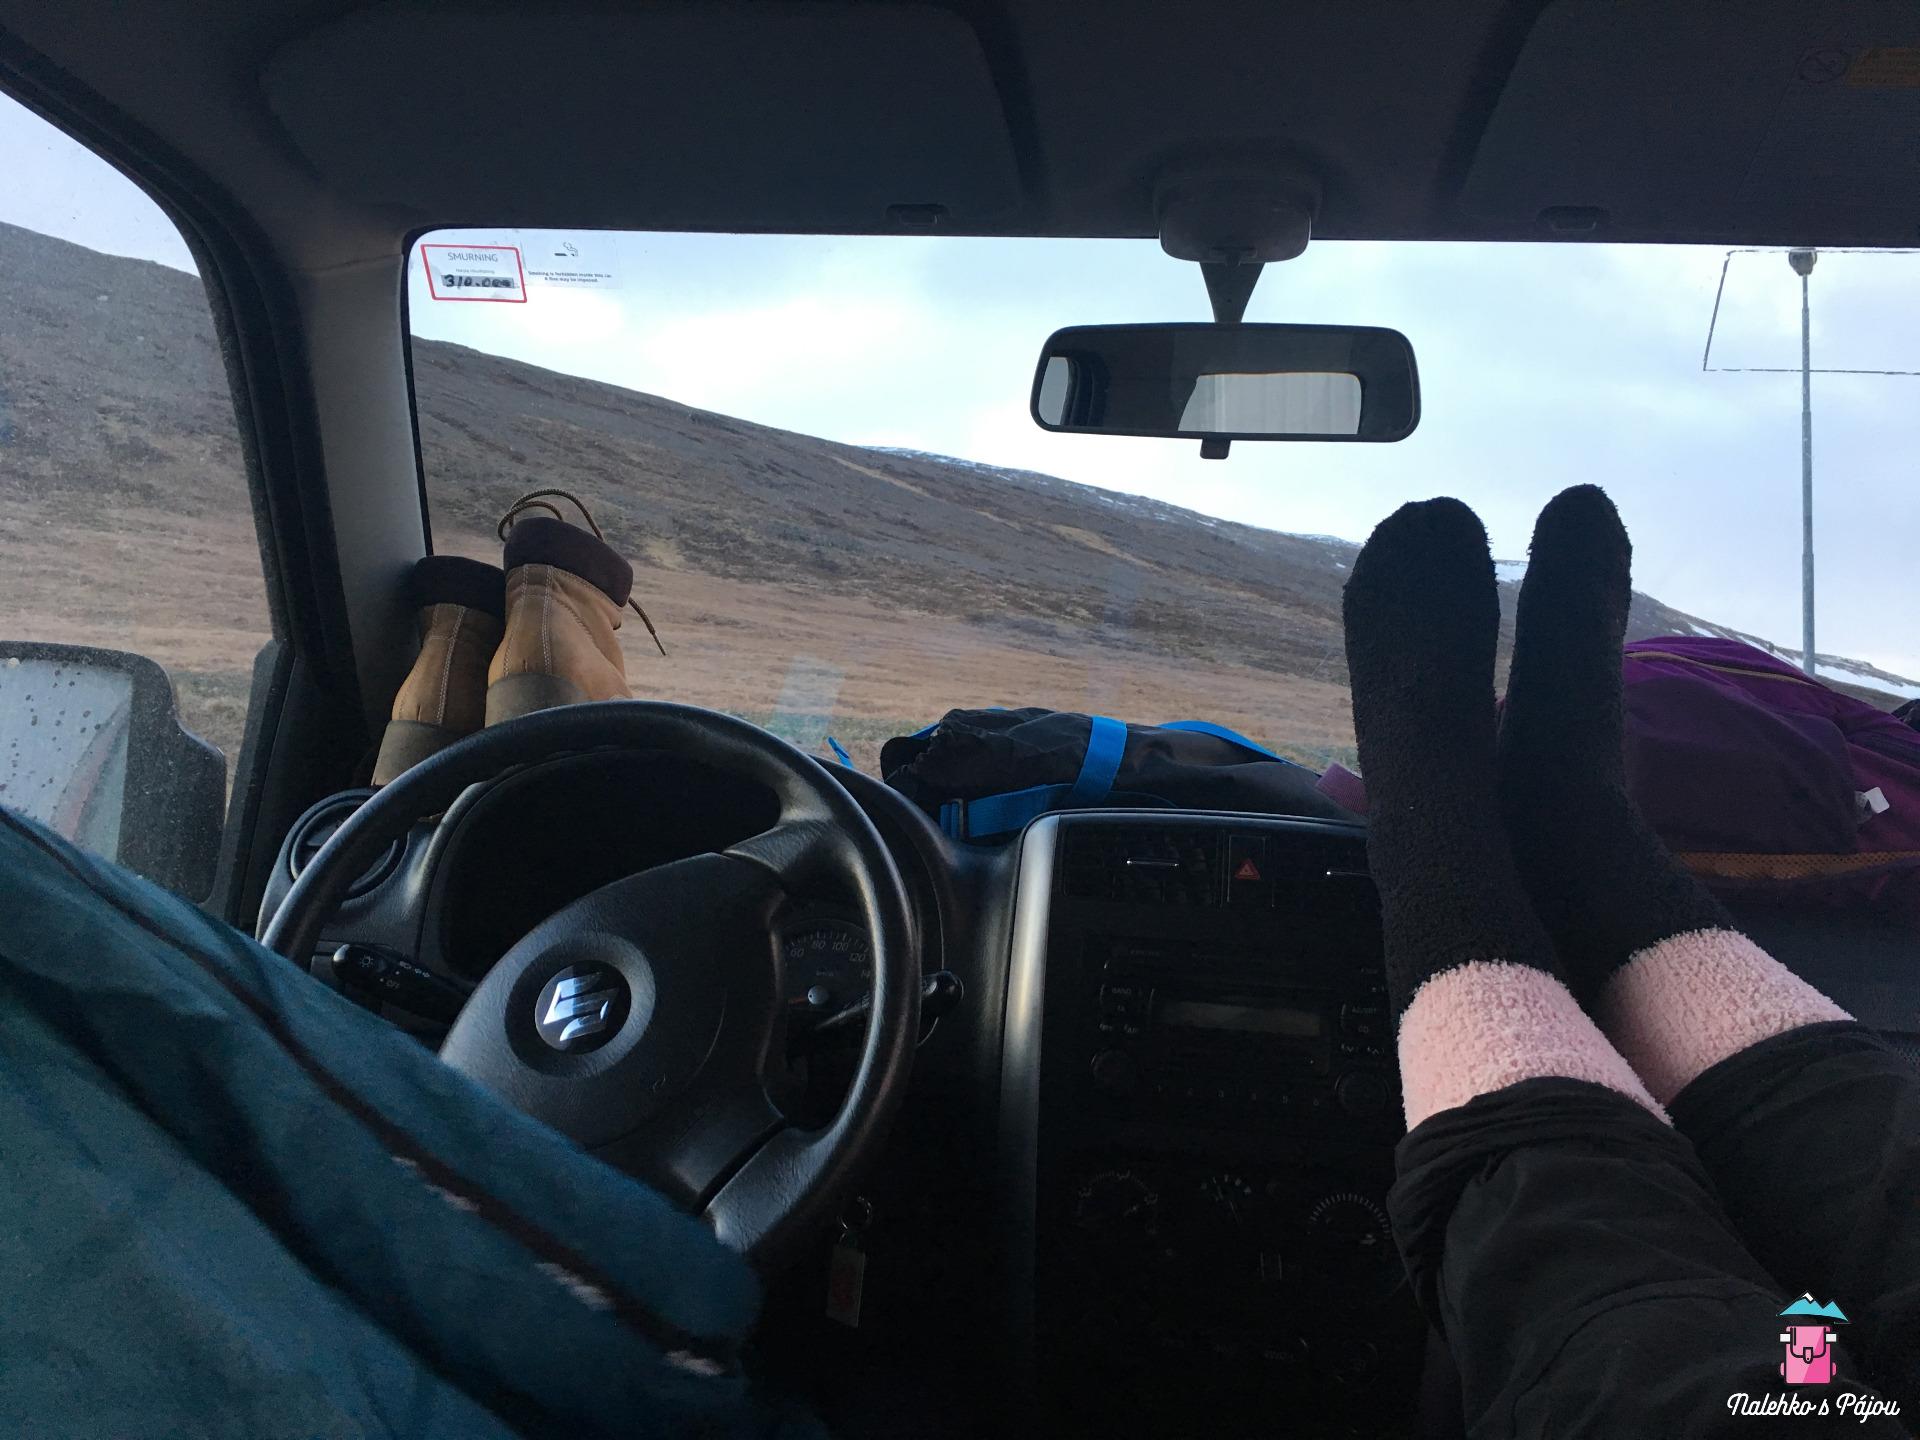 Spaní v Suzuki Jimny je docela na pohodu :)